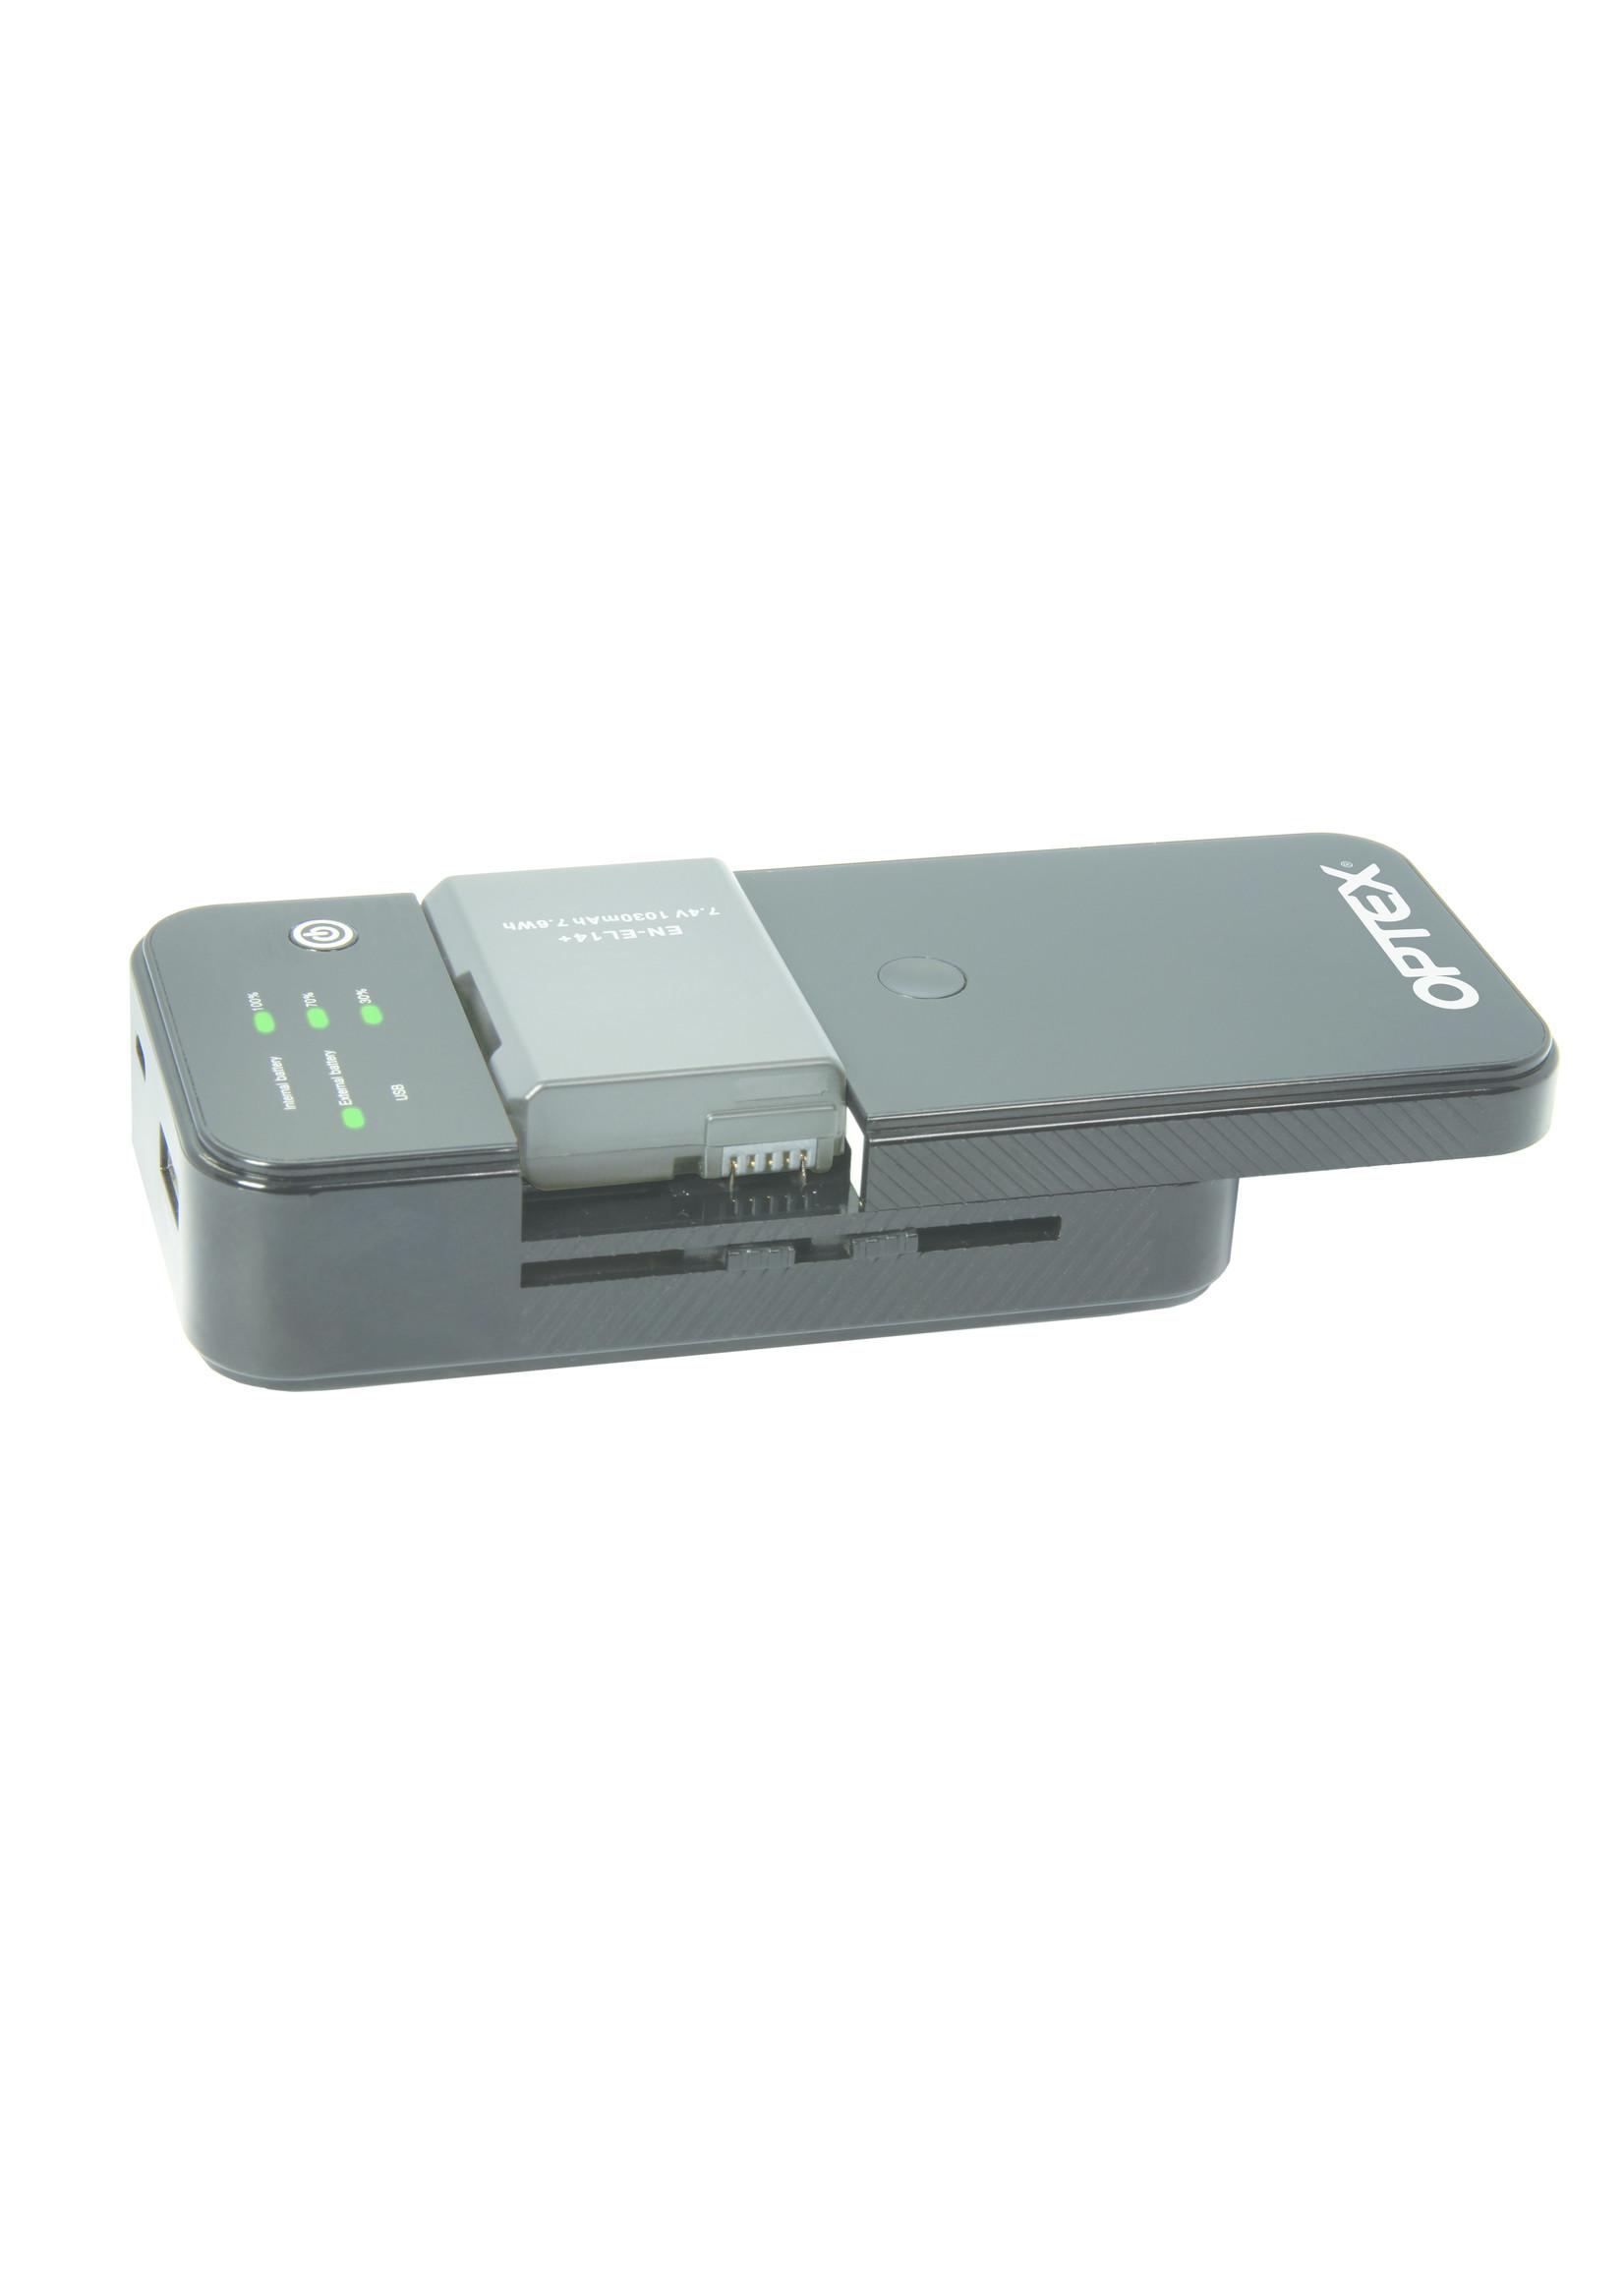 Optex LI8000 with Powerbank